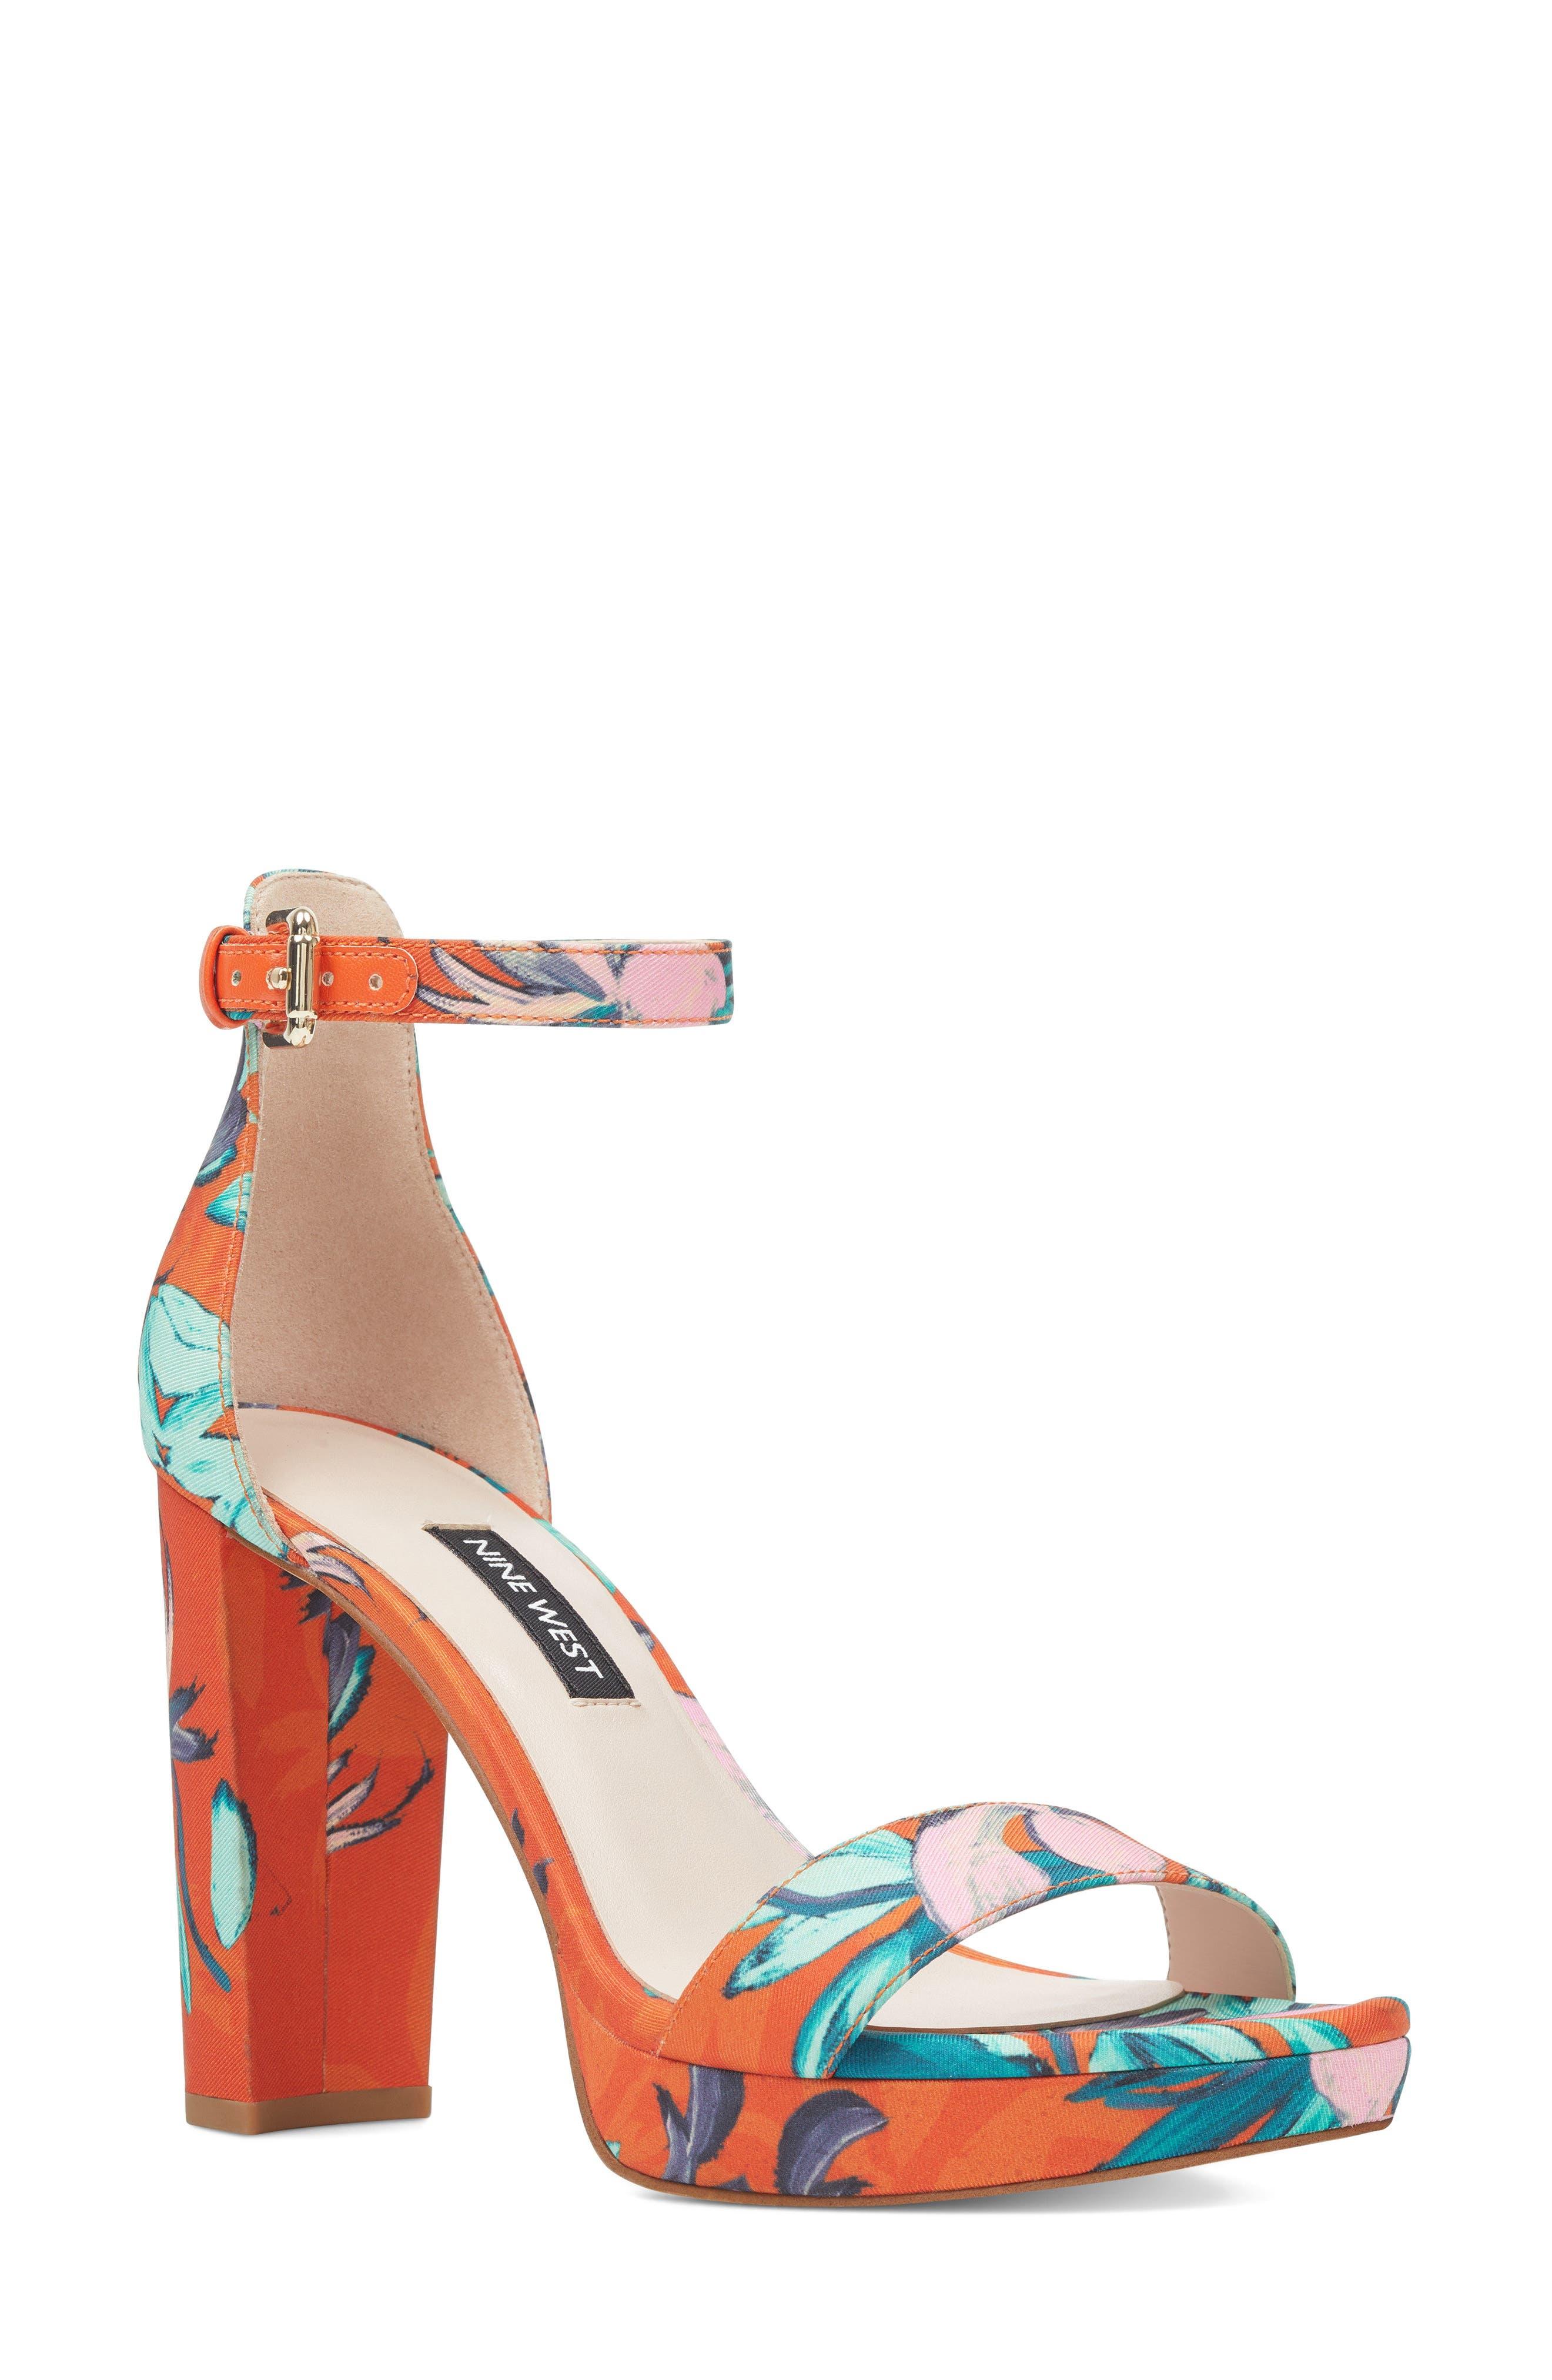 Dempsey Platform Sandal,                         Main,                         color, ORANGE MULTI FABRIC